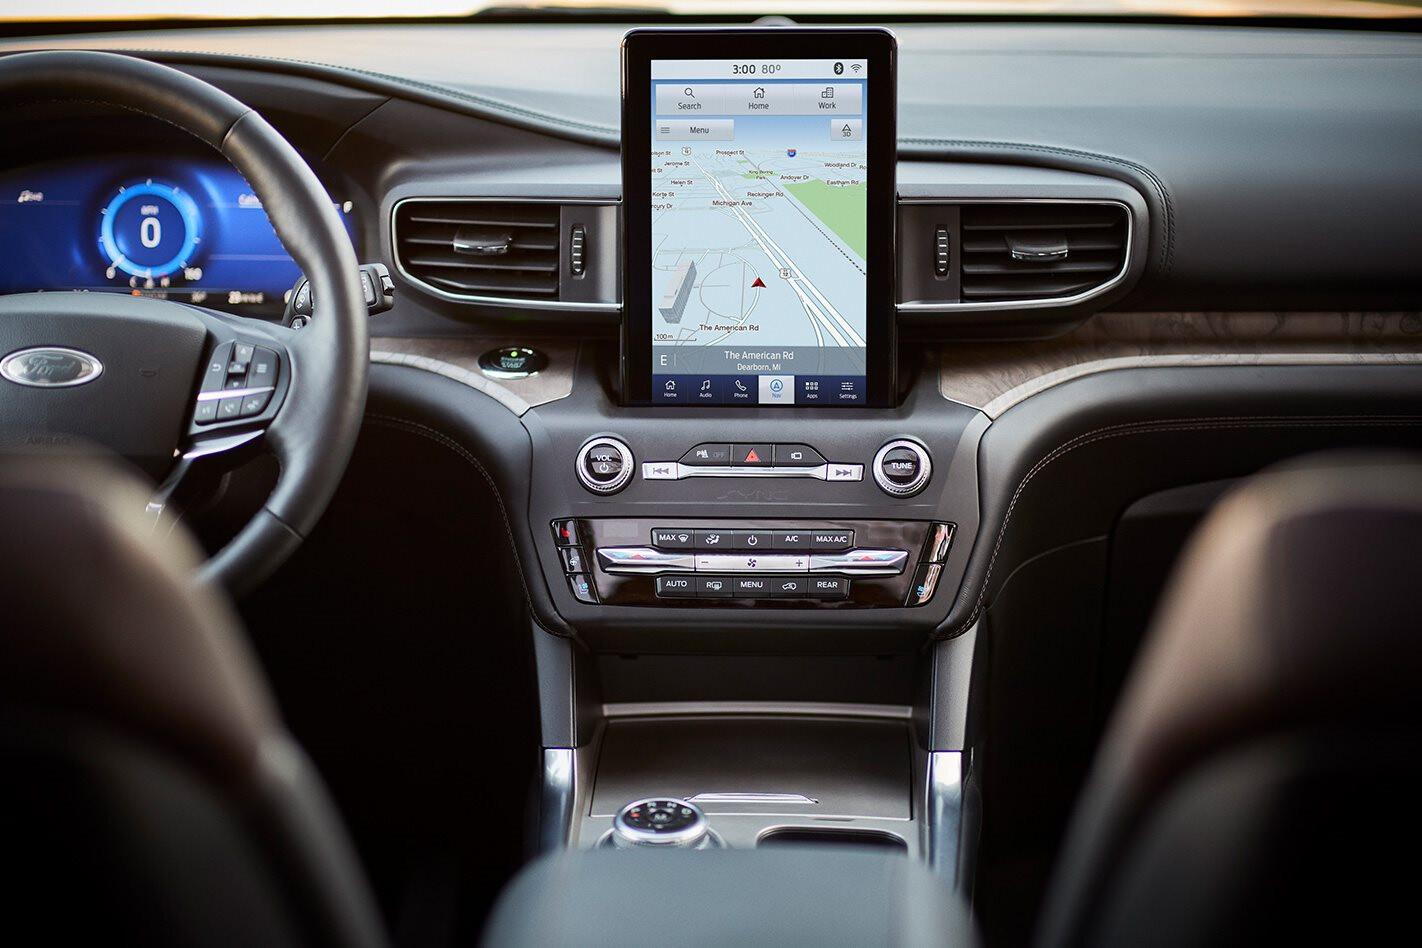 2019 Ford Explorer interior technology